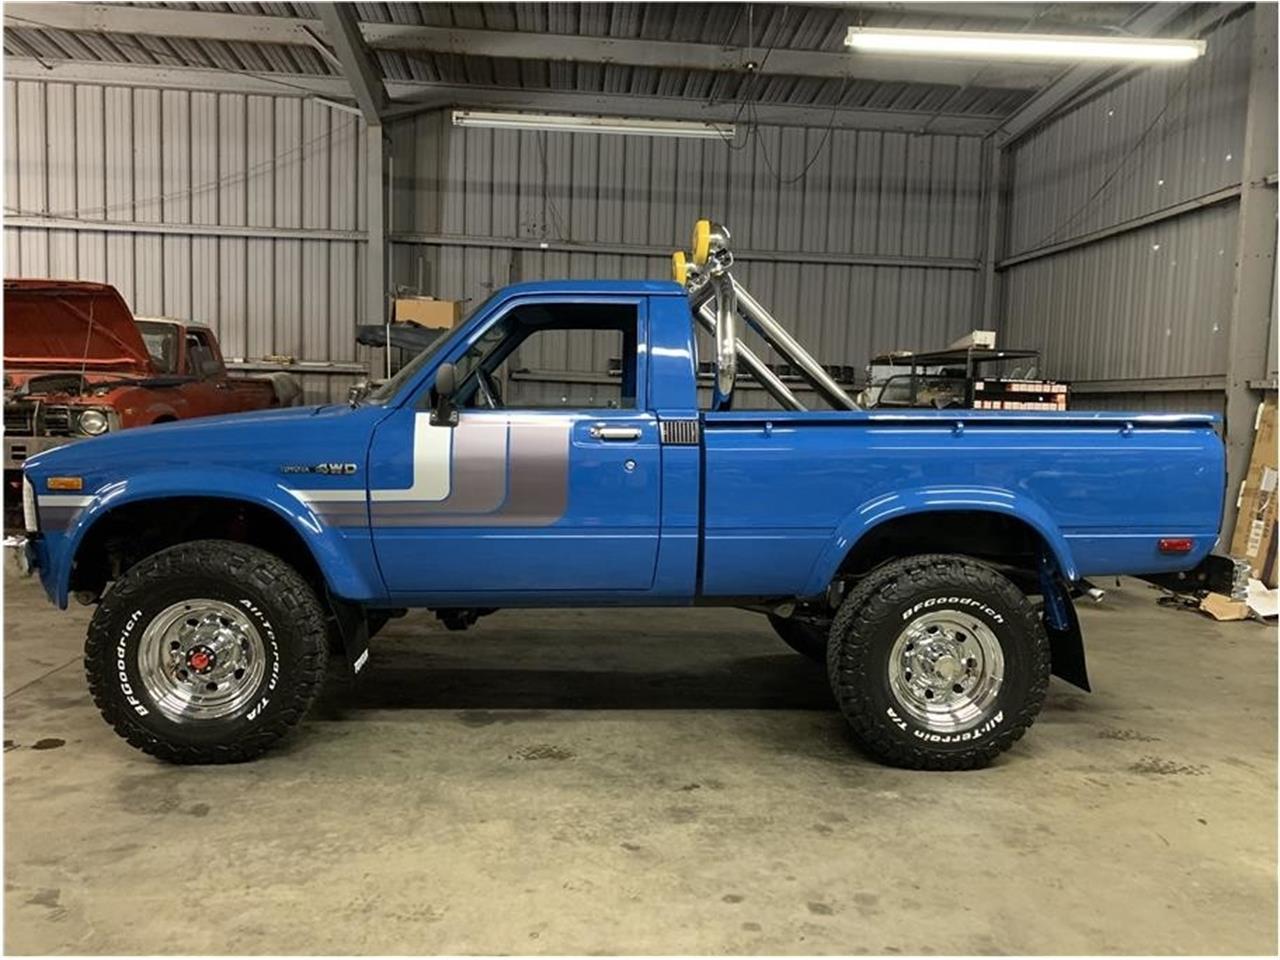 for sale 1979 toyota pickup in roseville, california cars - roseville, ca at geebo